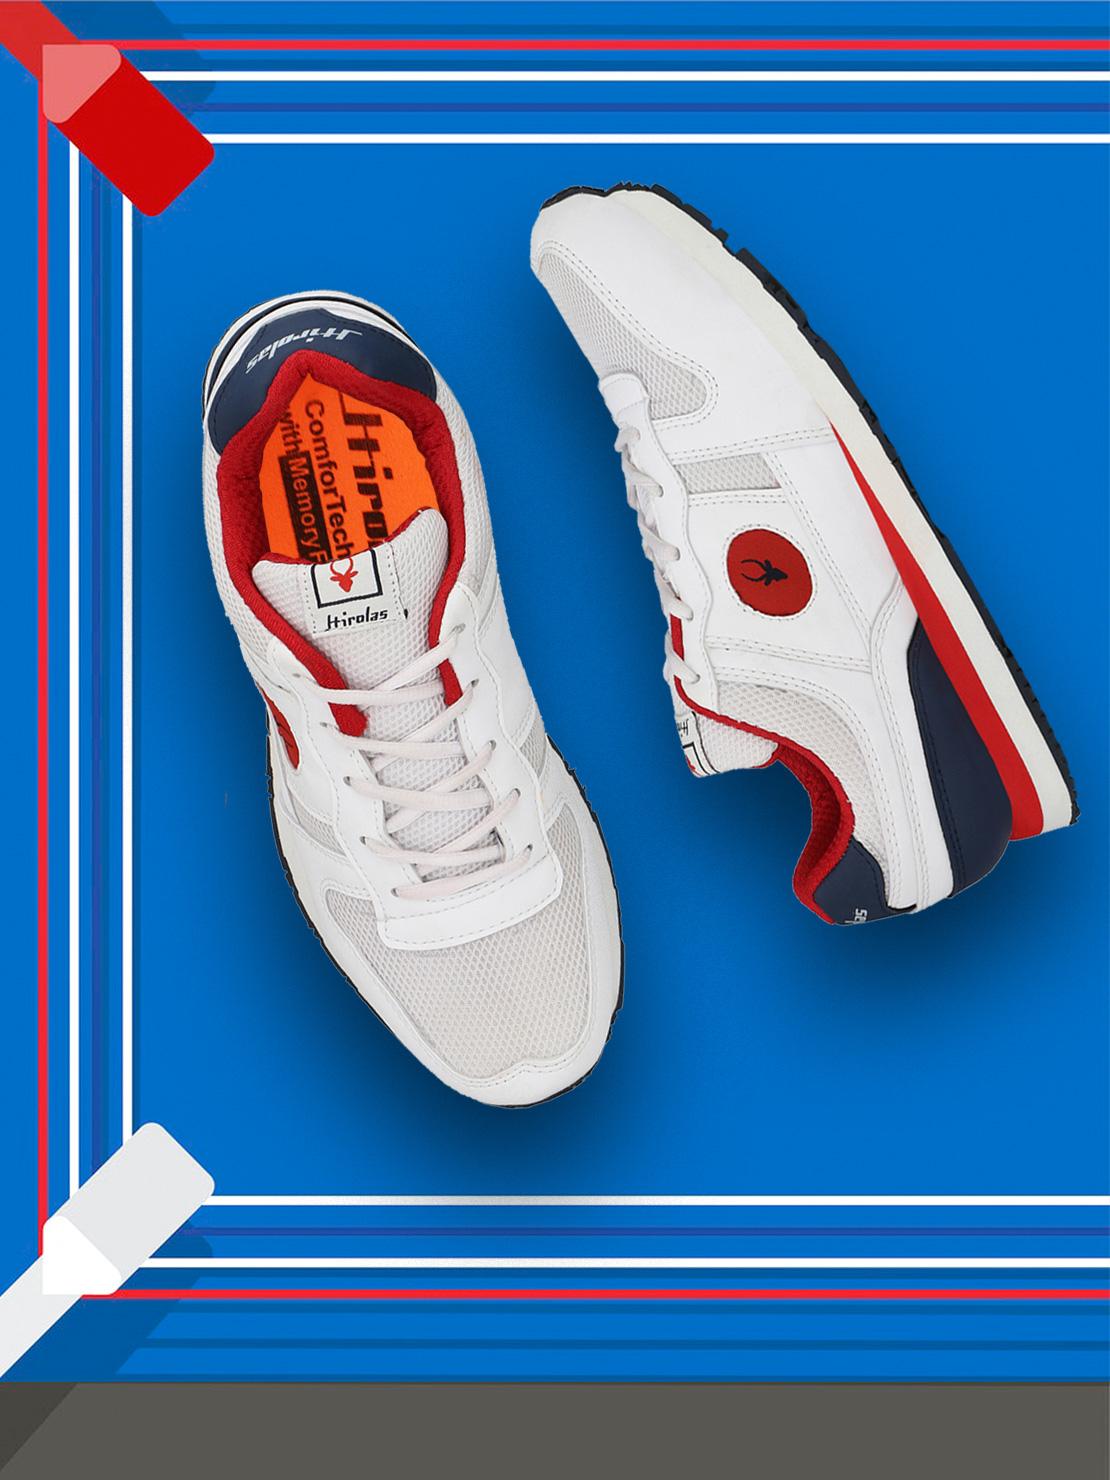 Hirolas   Hirolas Multi Sport Shock Absorbing Walking  Running Fitness Athletic Training Gym Fashion Sneaker Shoes - White/Red